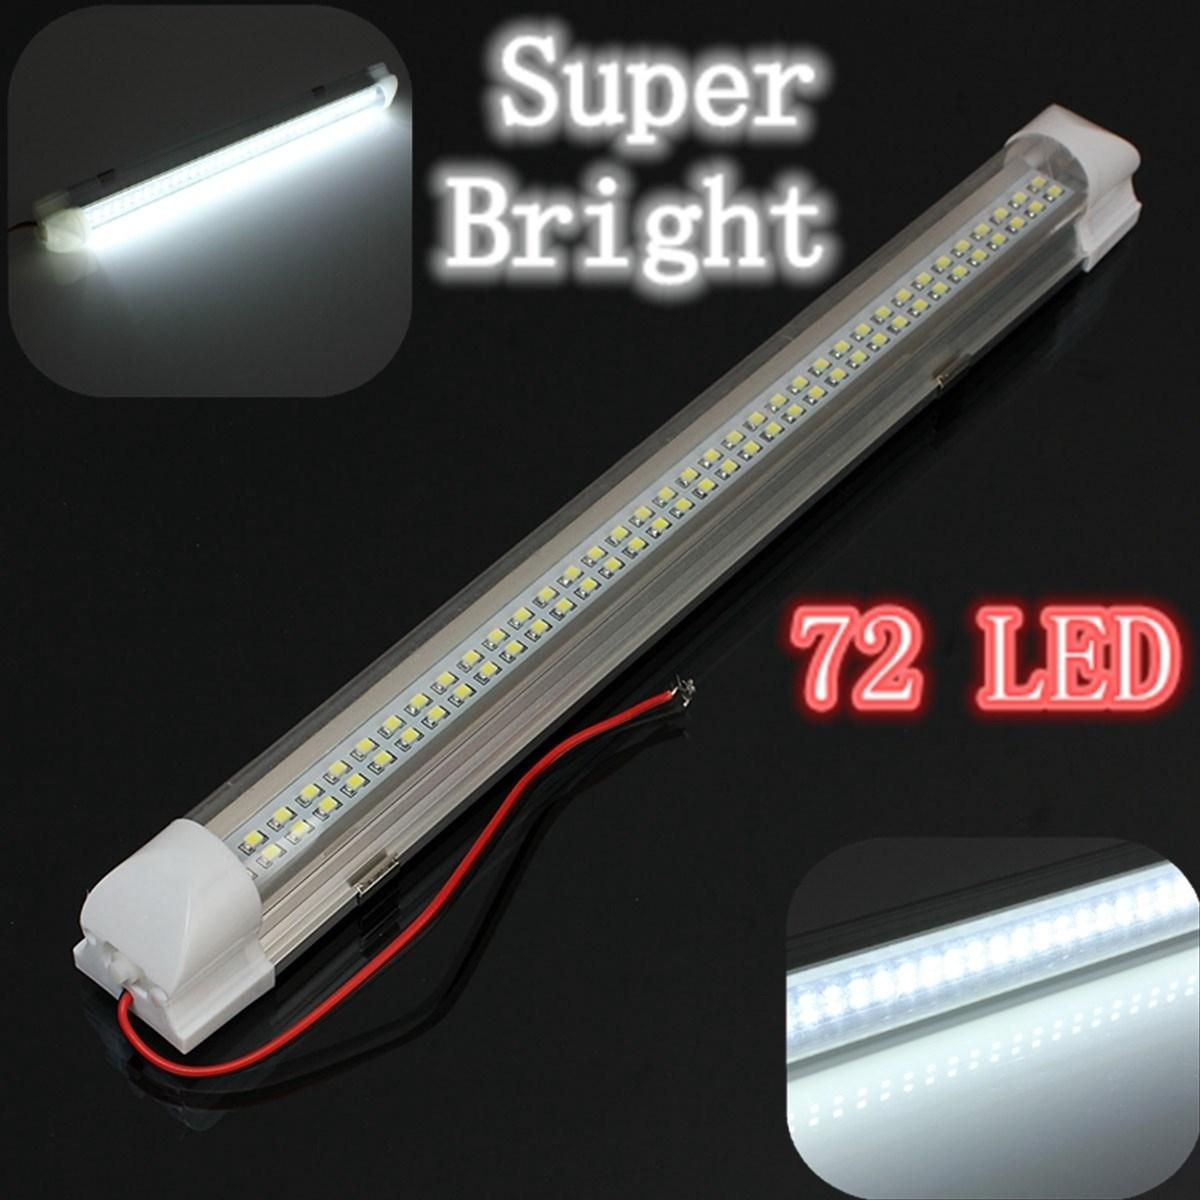 12V 72 LED Car Interior White Strip Lights Bar Lamp Van Caravan ON OFF Switch-UK